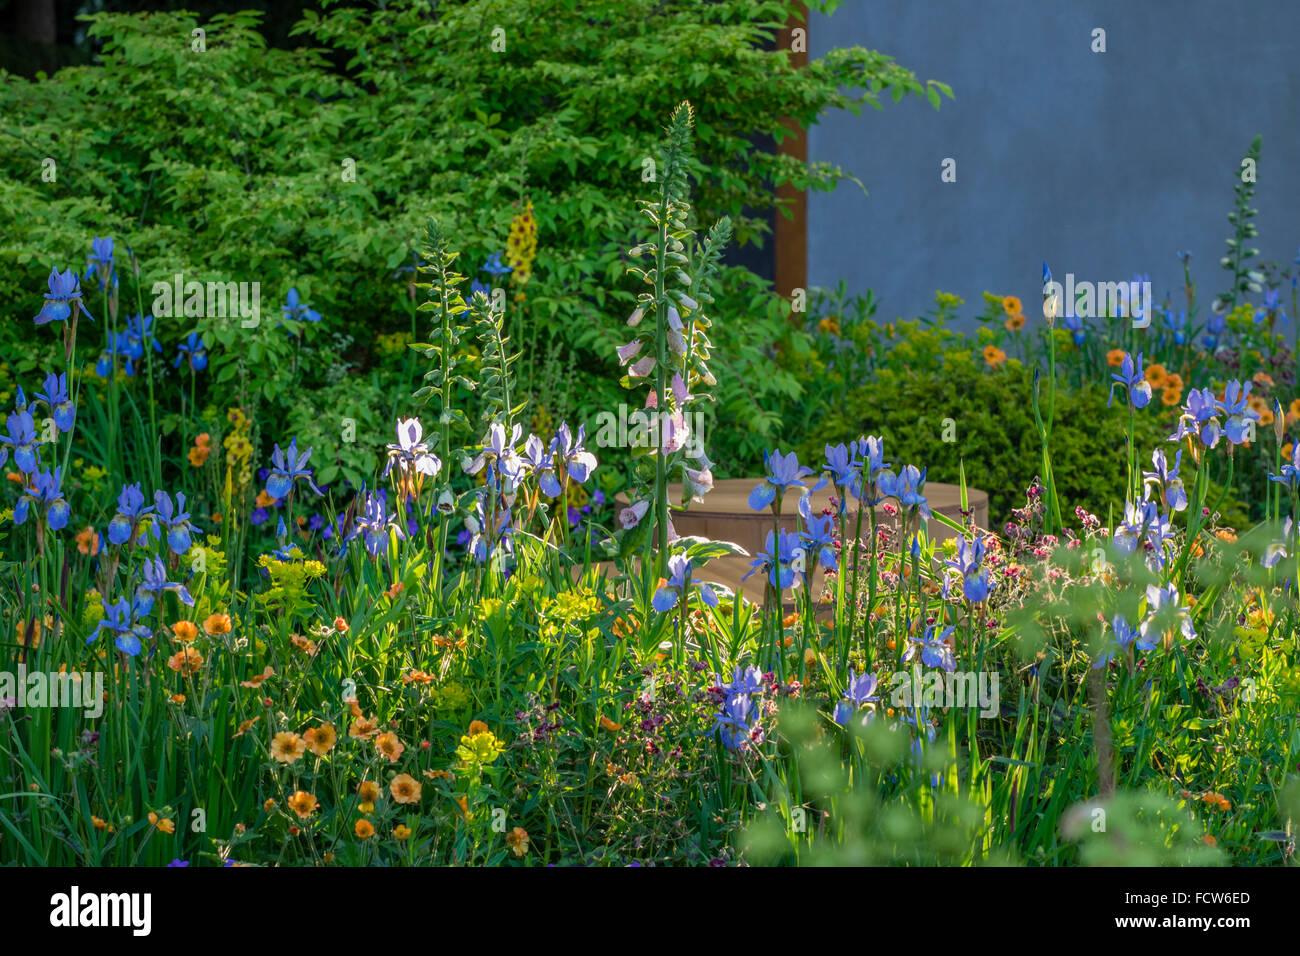 White apron homebase - The Homebase Garden Urban Retreat Designed By Adam Frost Rhs Chelsea Flower Show 2015